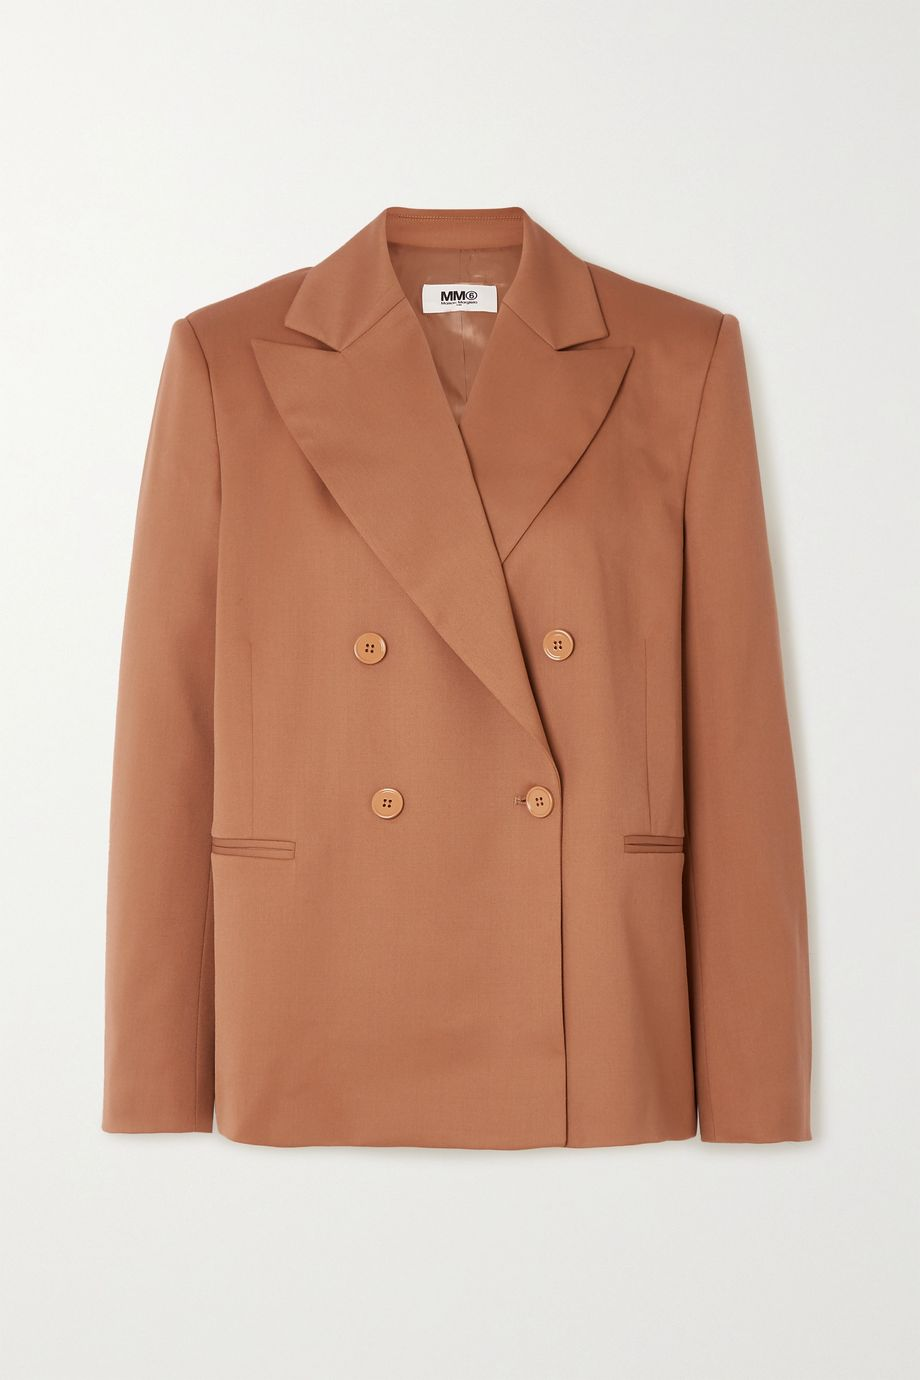 MM6 Maison Margiela Double-breasted twill blazer